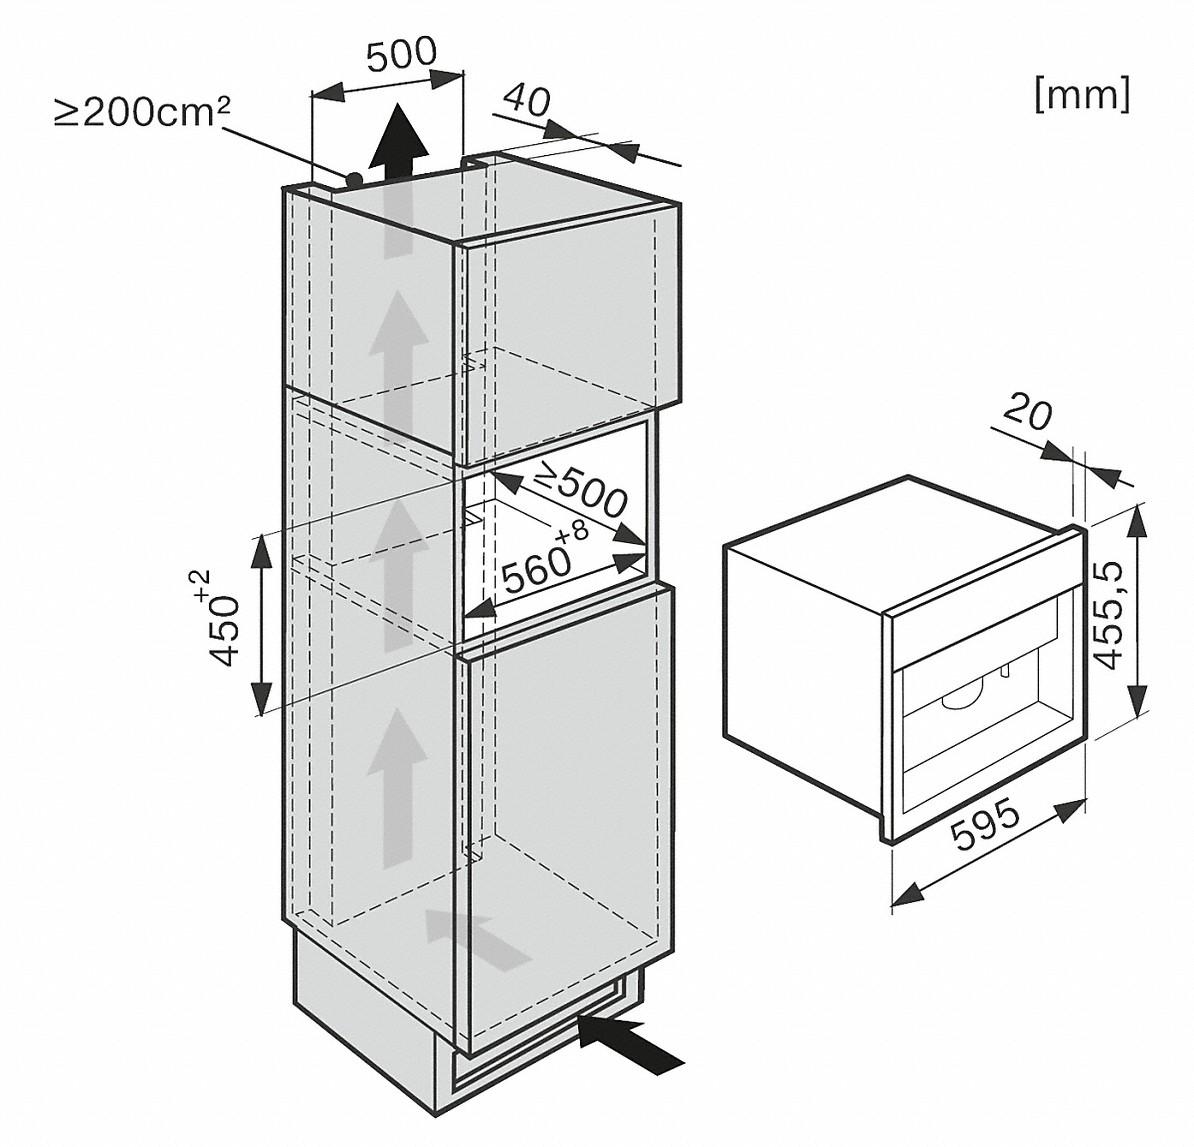 miele koffieautomaten cva 6800 inbouwkoffiemachine. Black Bedroom Furniture Sets. Home Design Ideas